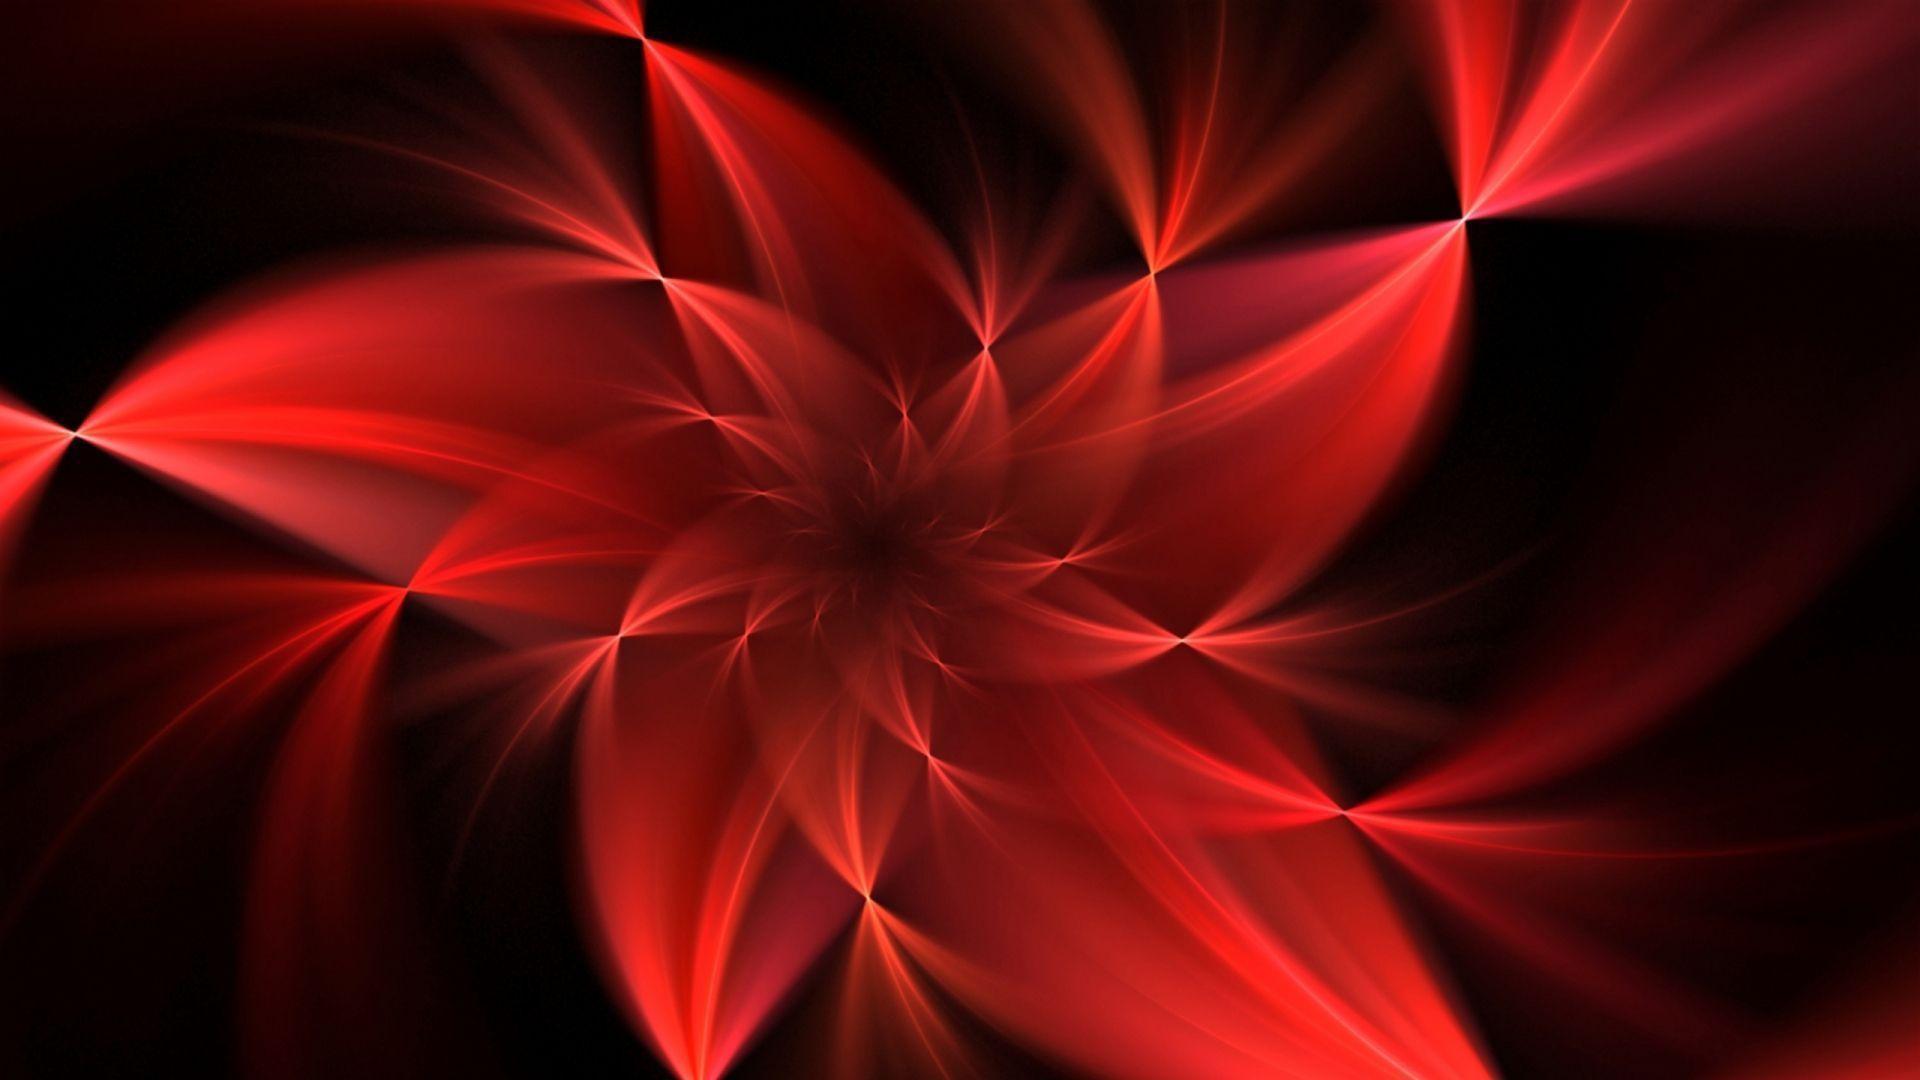 red neon wallpaper - photo #8